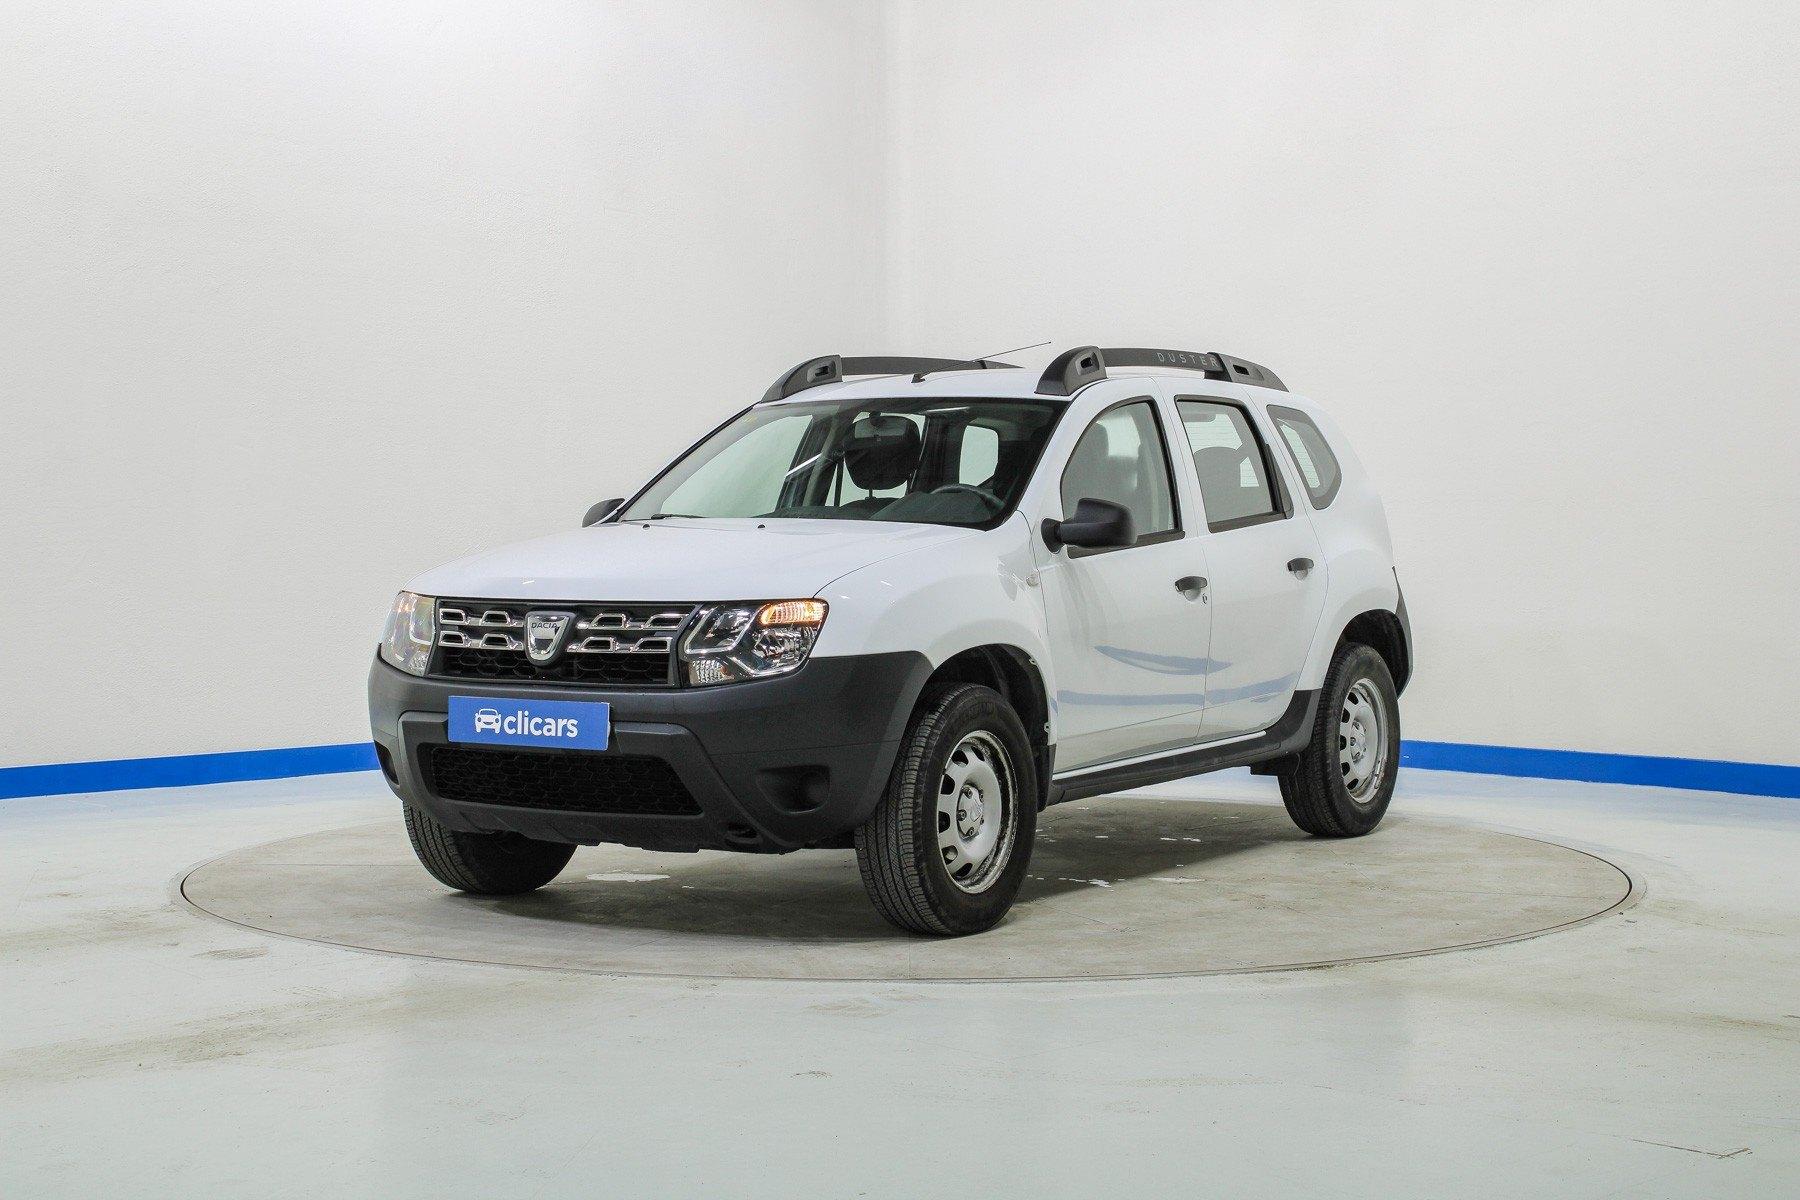 Dacia Duster Gasolina Base 1.6 84kW (115CV) 4X2 EU6 1